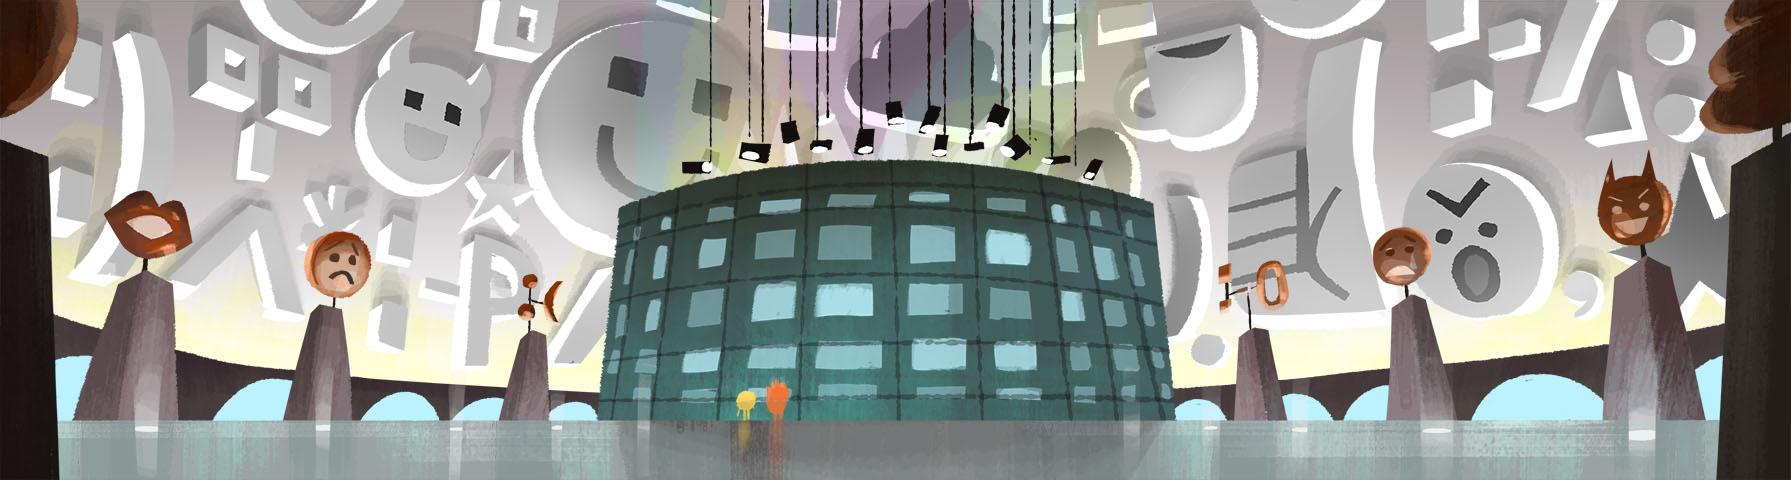 Interior of Emoji workspace building